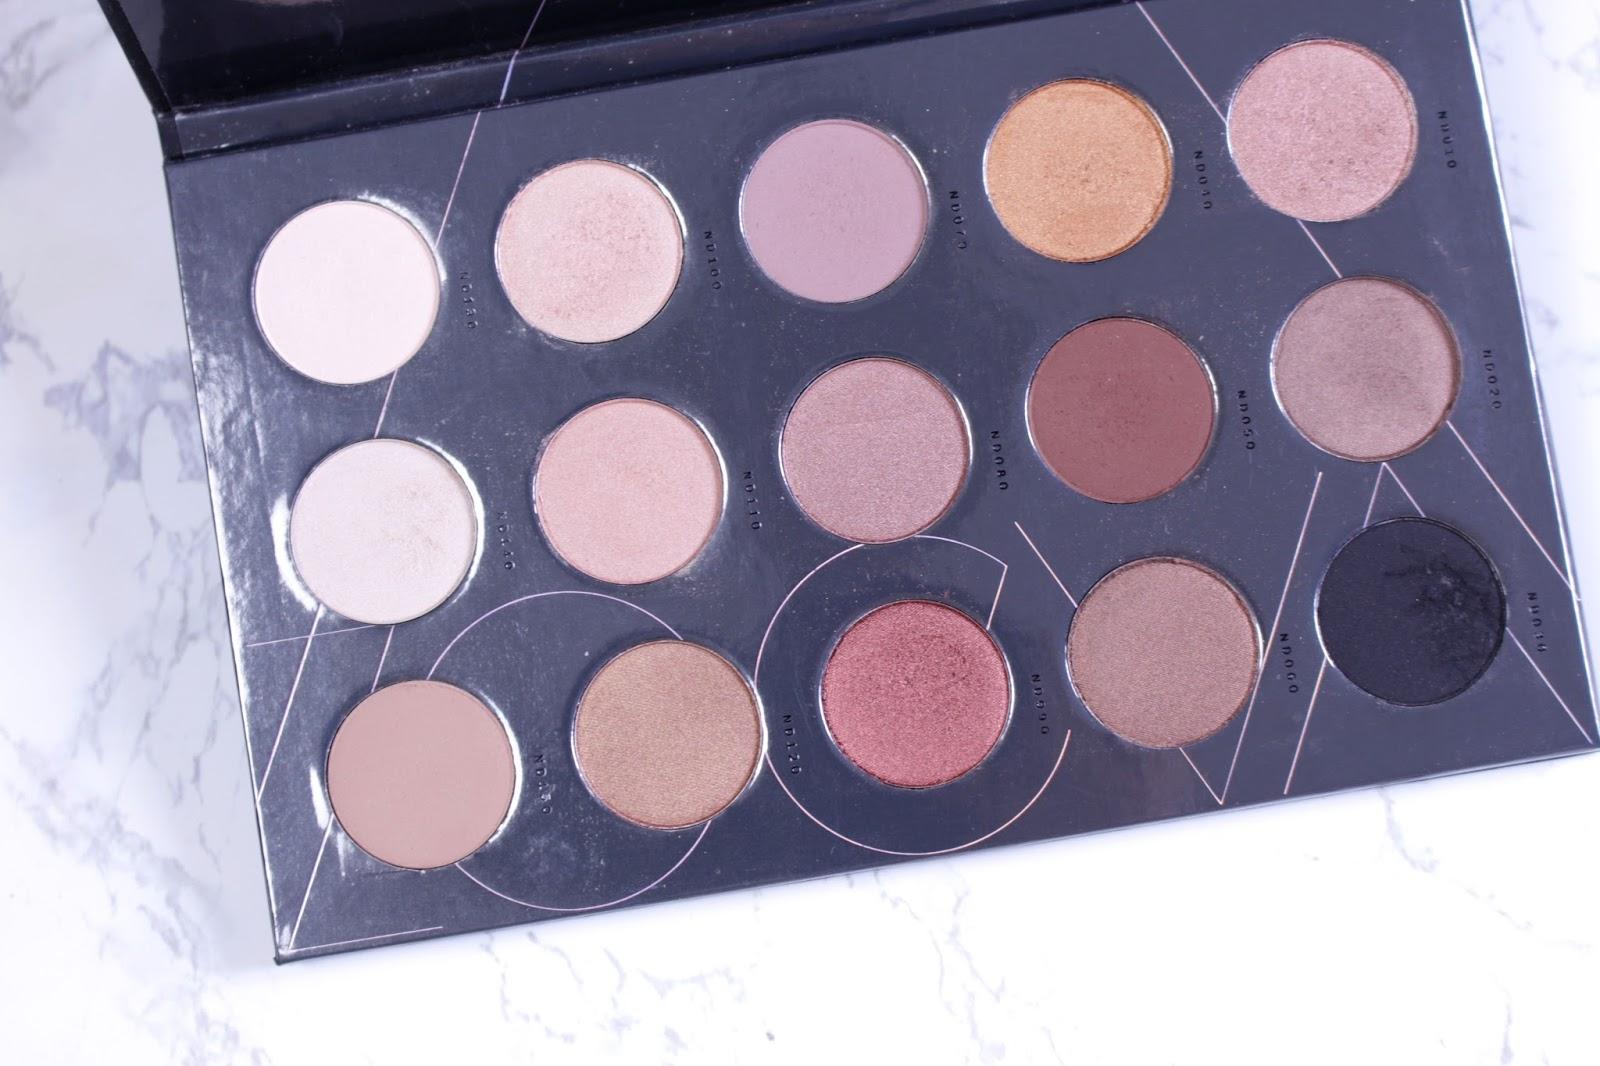 Zoeva Nude Spectrum Palette